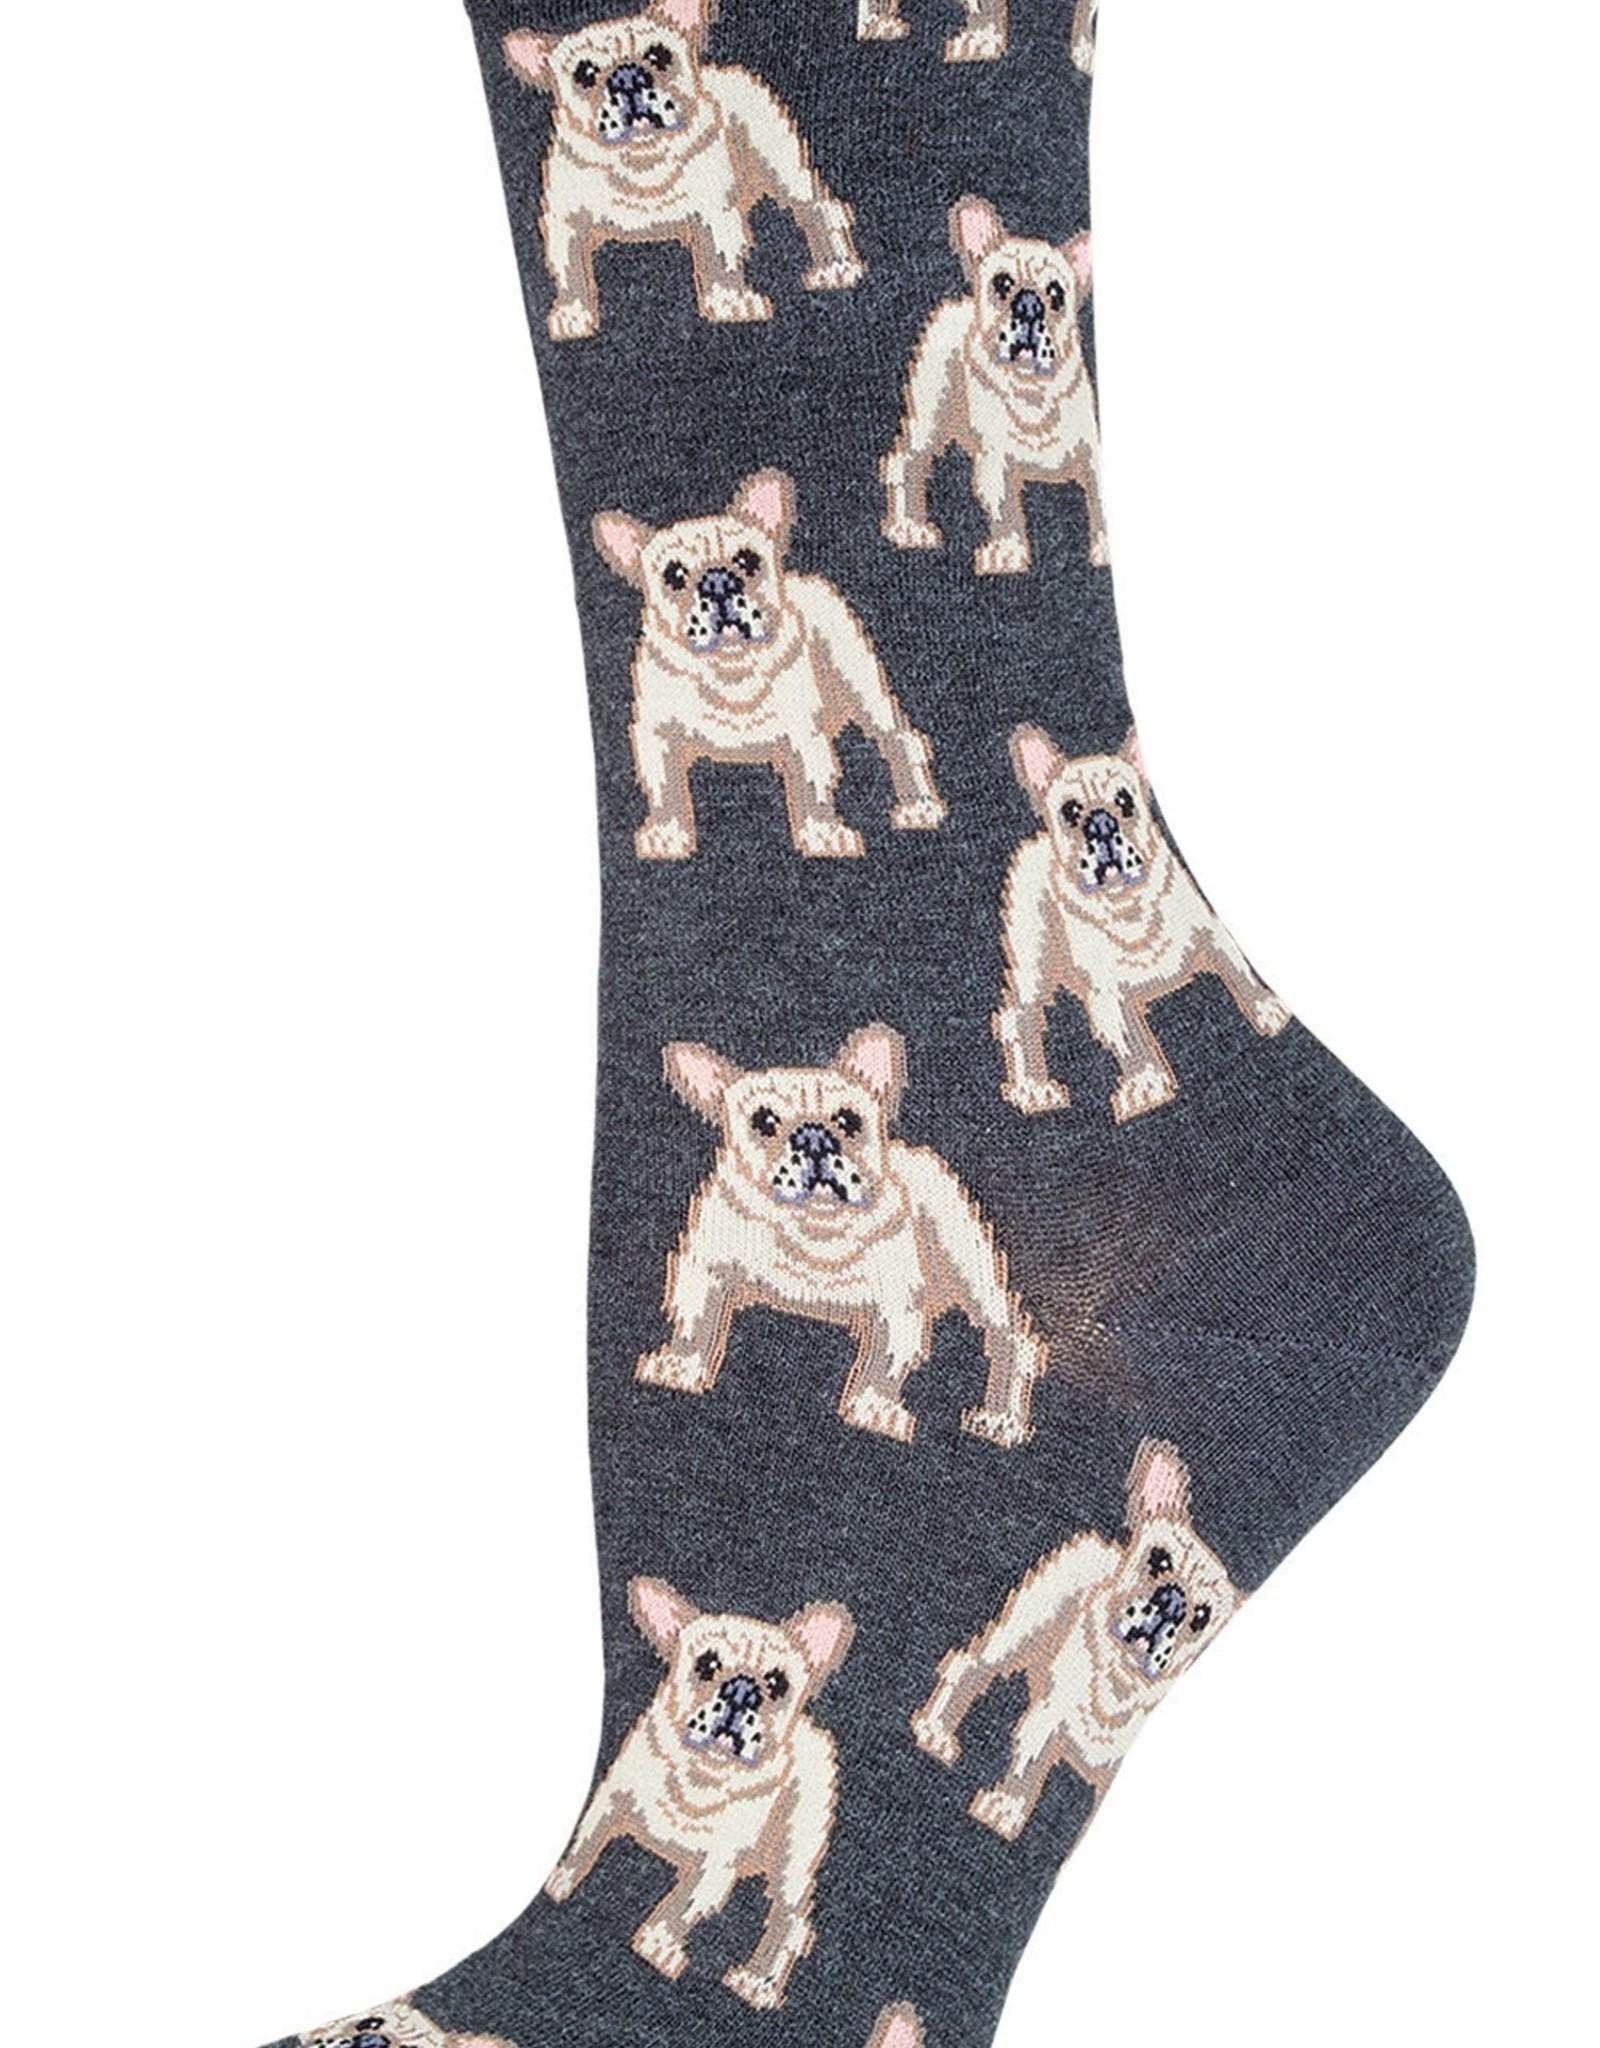 Frenchie charcoal heather socks